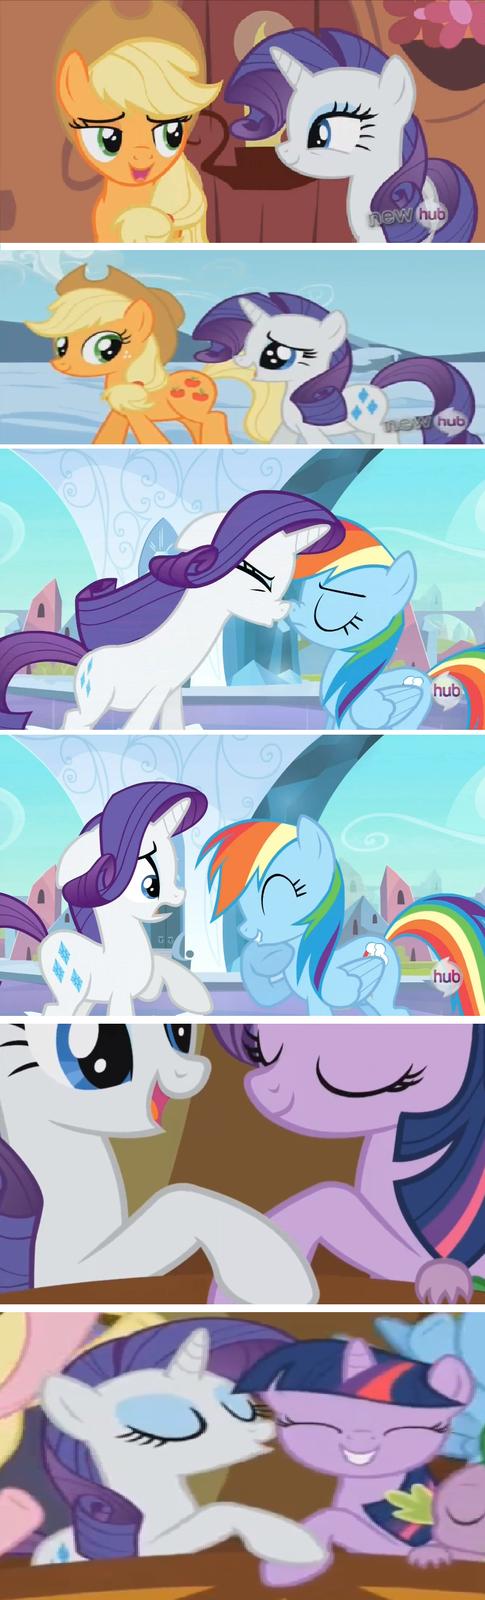 Congratulations, Rarity, you're the new Rainbow Dash.